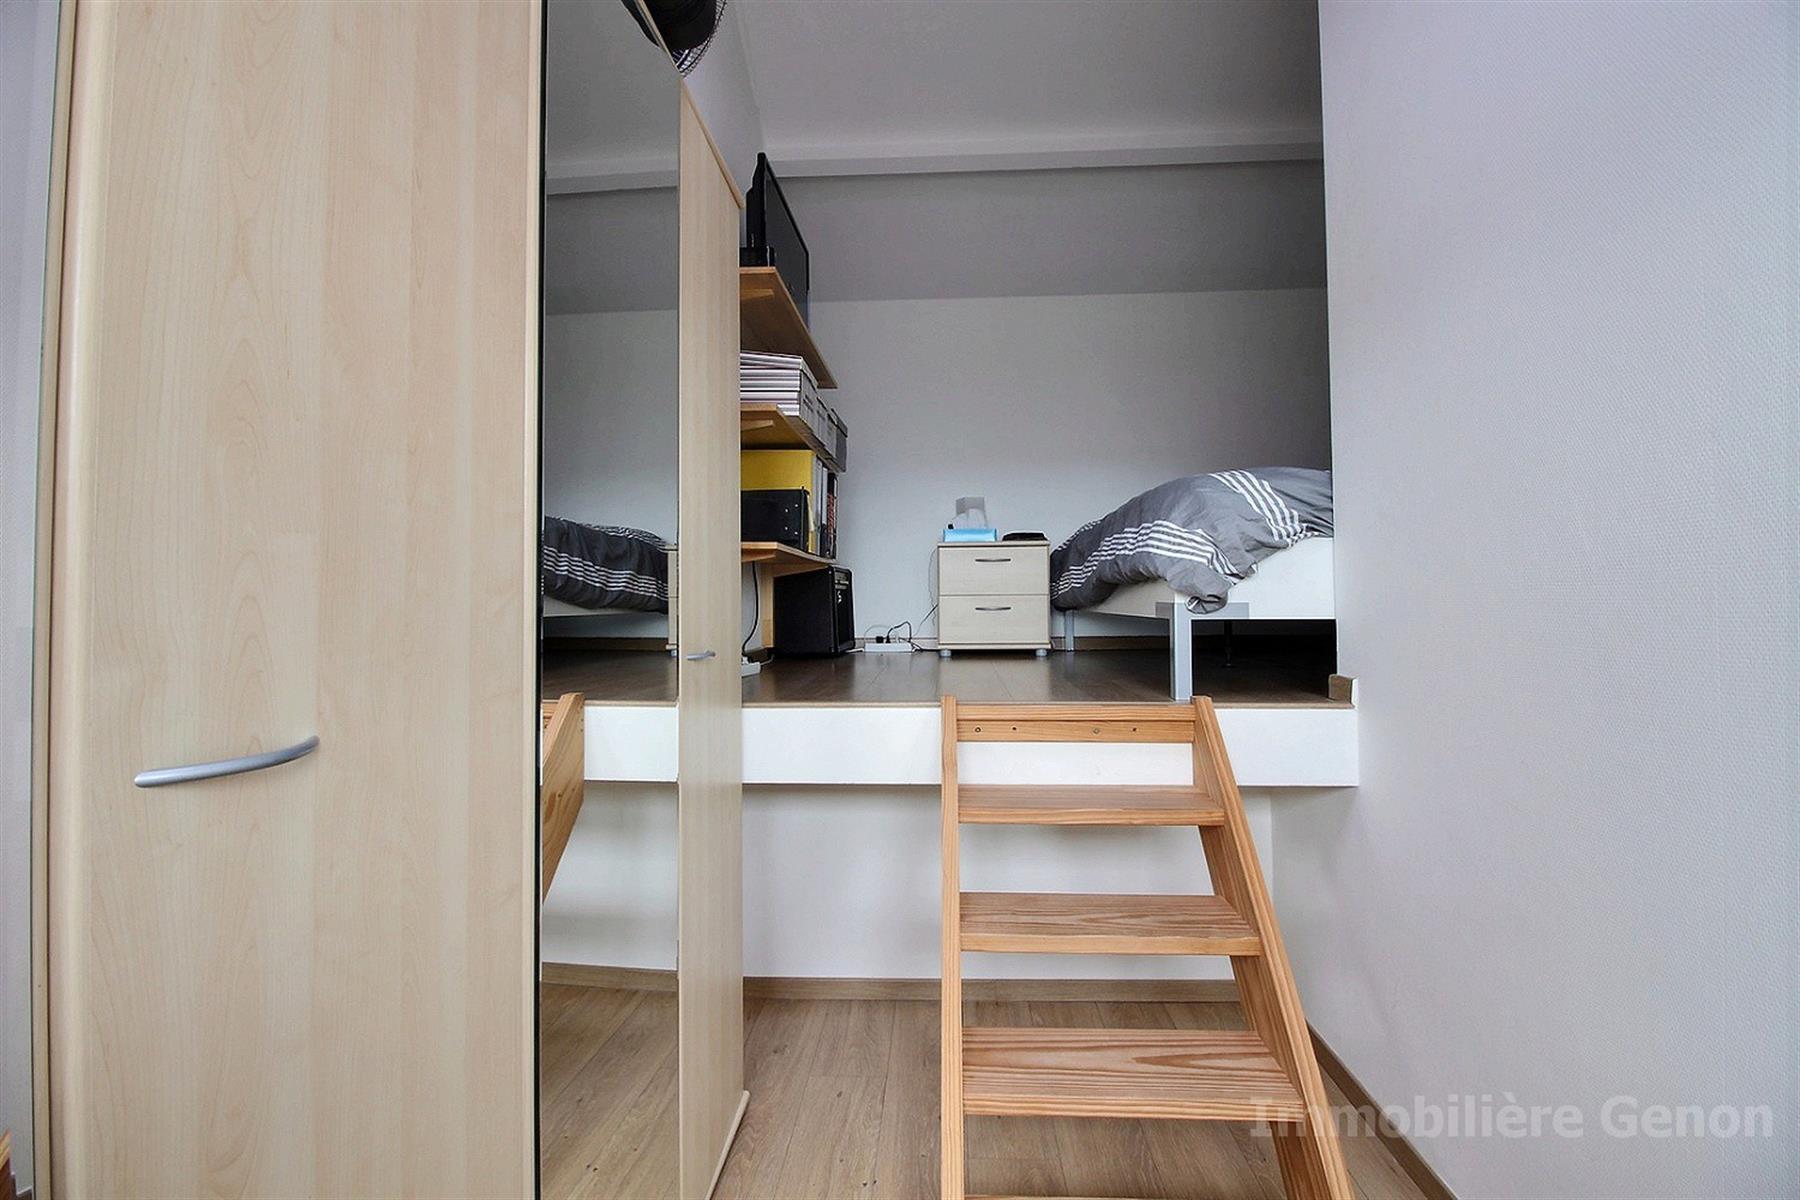 Maison - Ottignies-Louvain-la-Neuve - #4532084-10